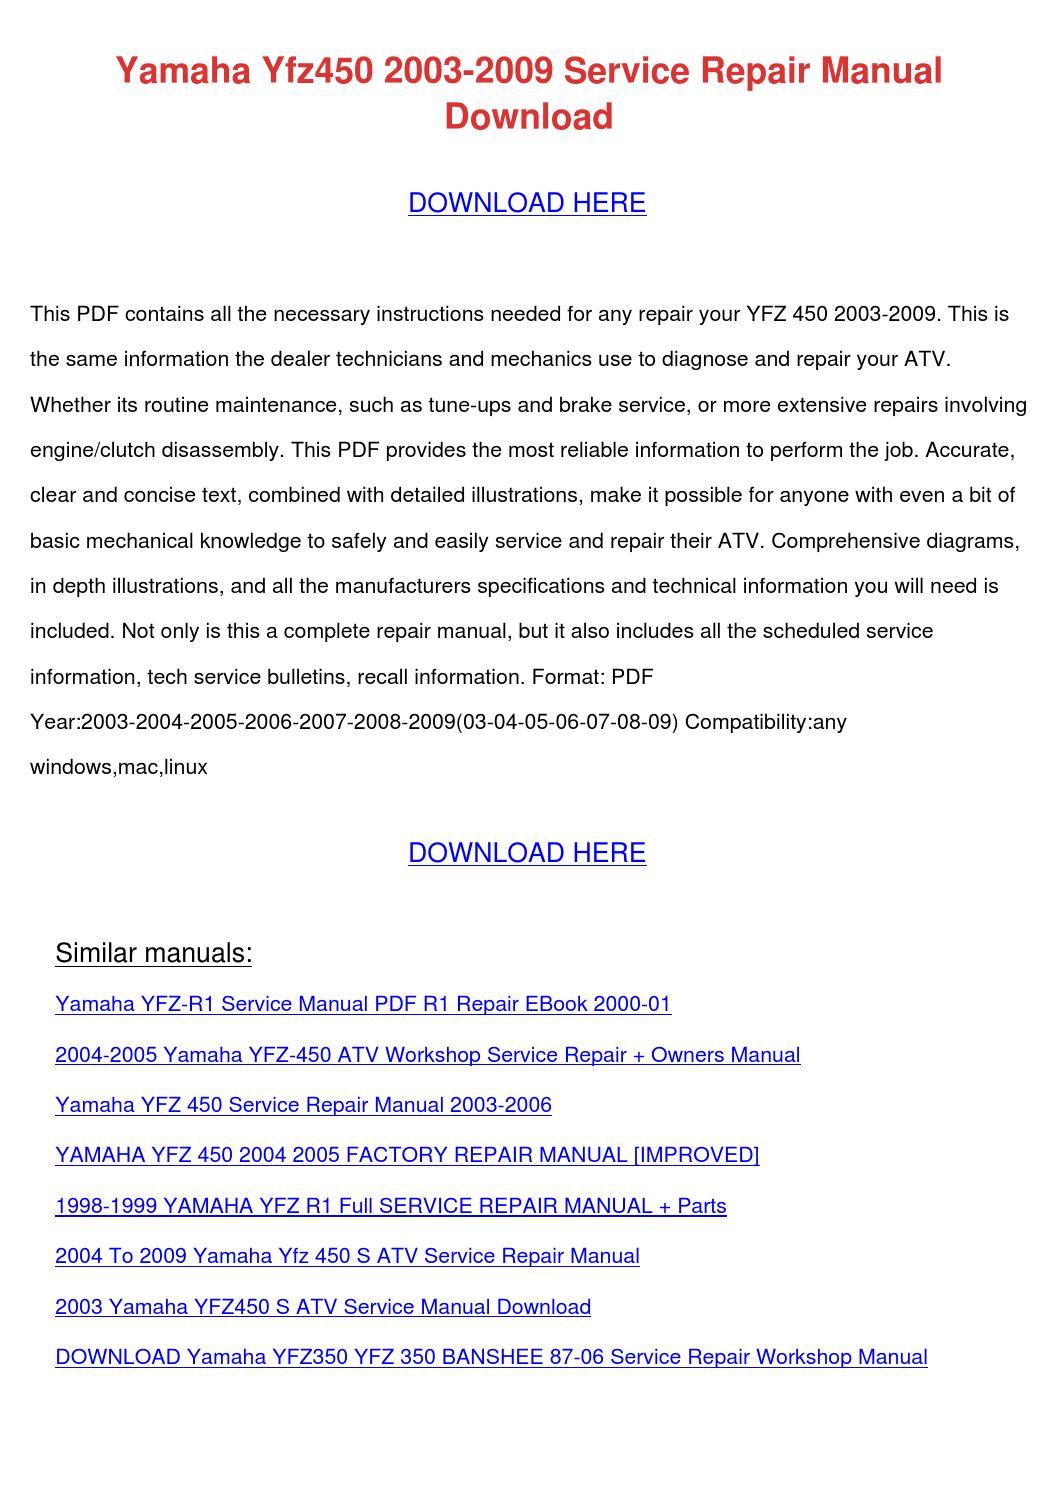 Yamaha Yfz450 2003 2009 Service Repair Manual by HarleyFreeland ...